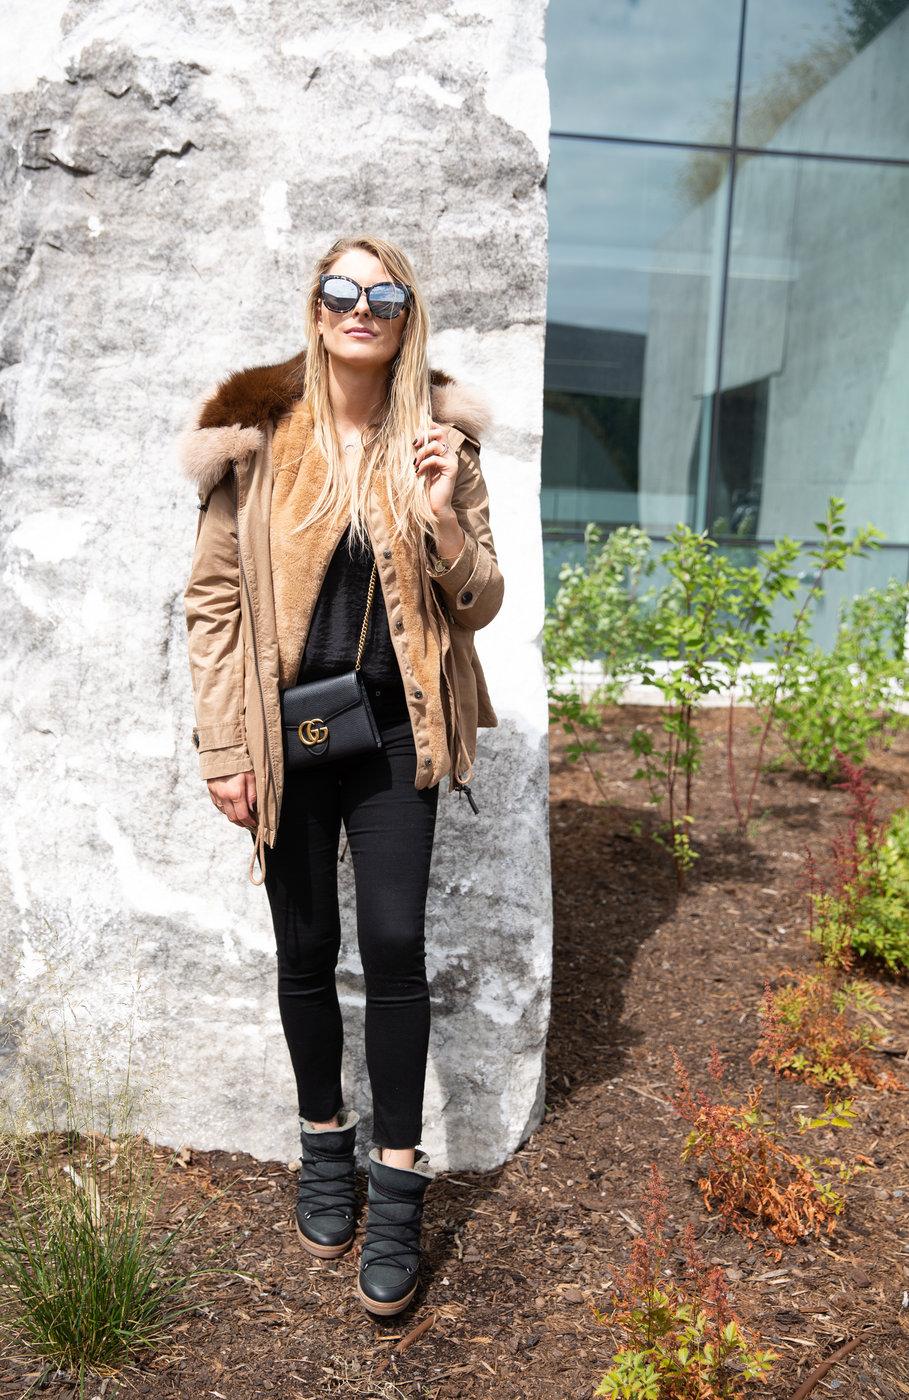 1 person, girl in fur coat